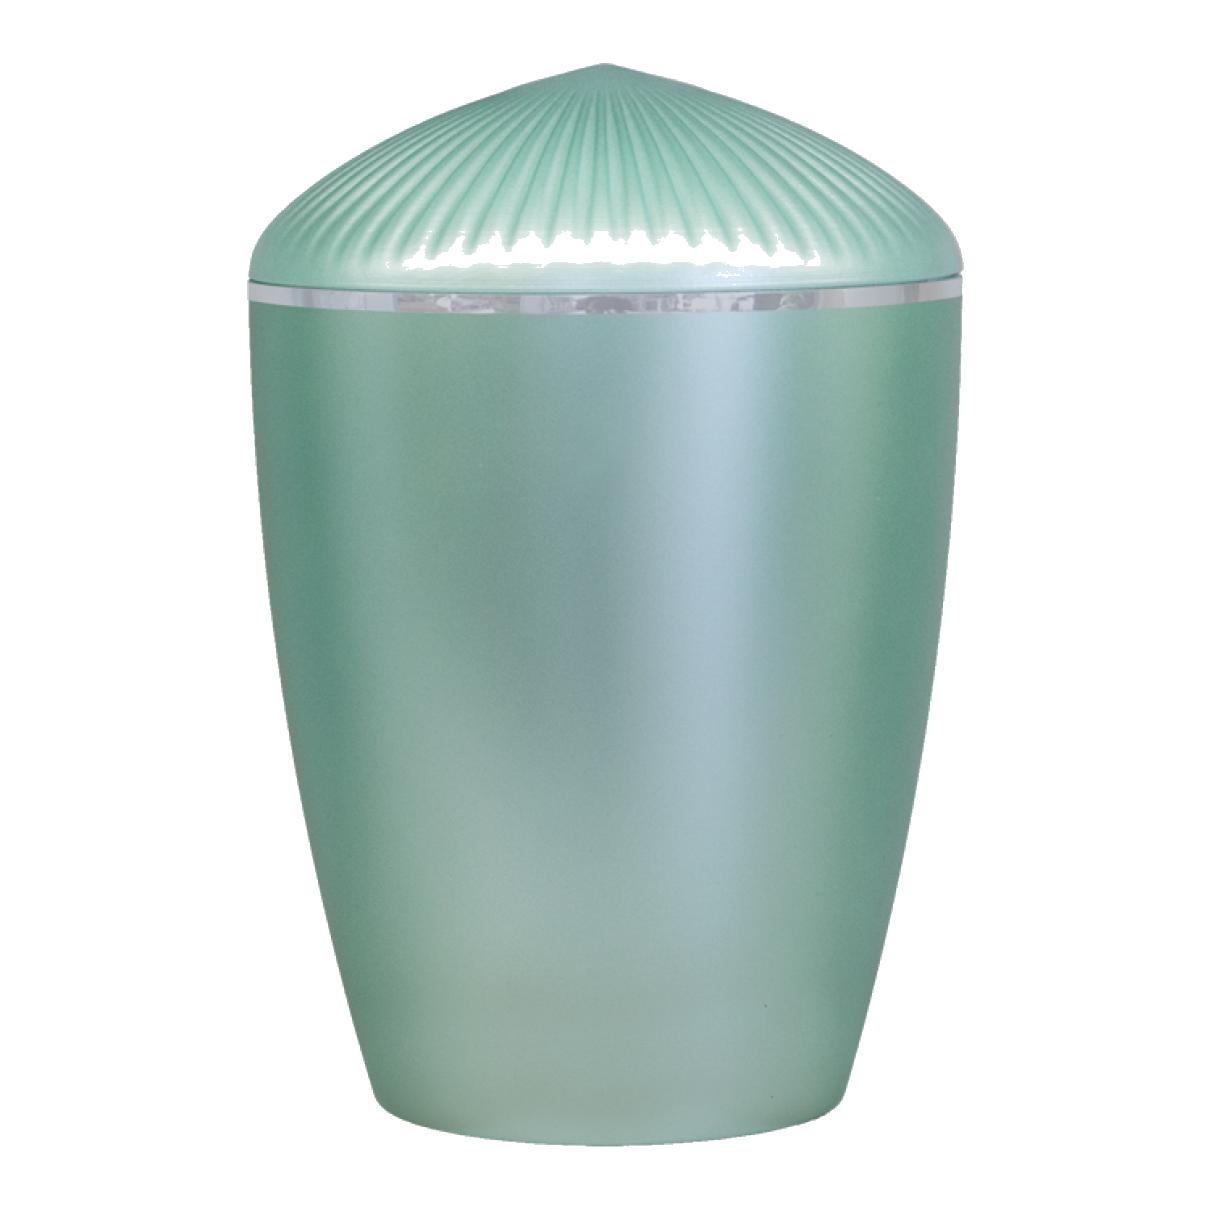 Ferndown Silver Band Cremation Urn – MInt